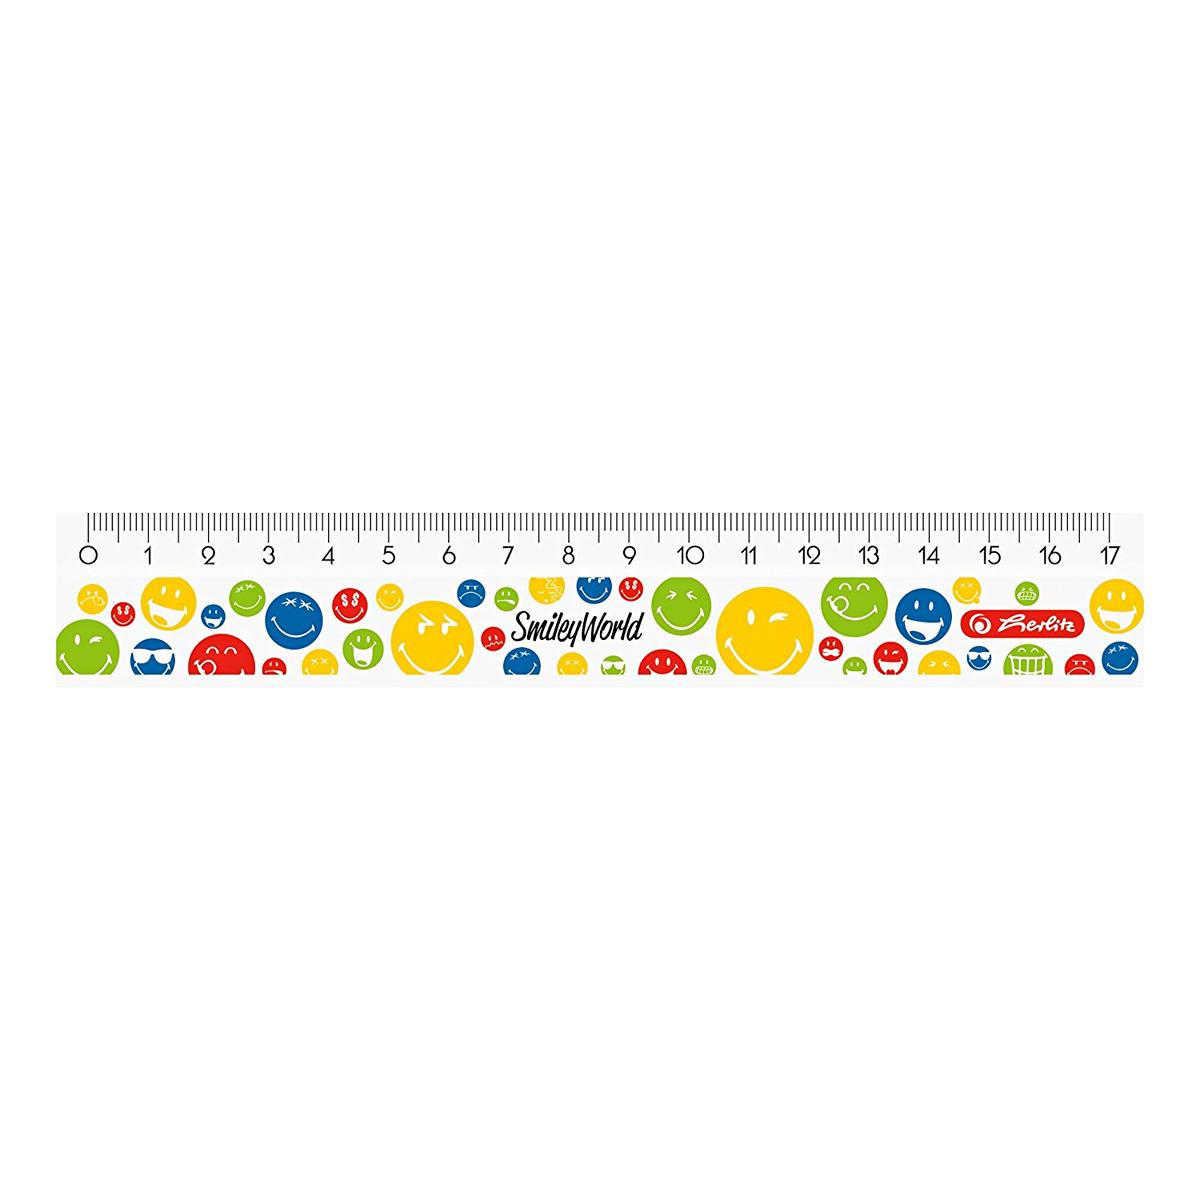 Riglă din Plastic, 17 Centimetri, Smileyworld Rainbow, Herlitz, 50001965